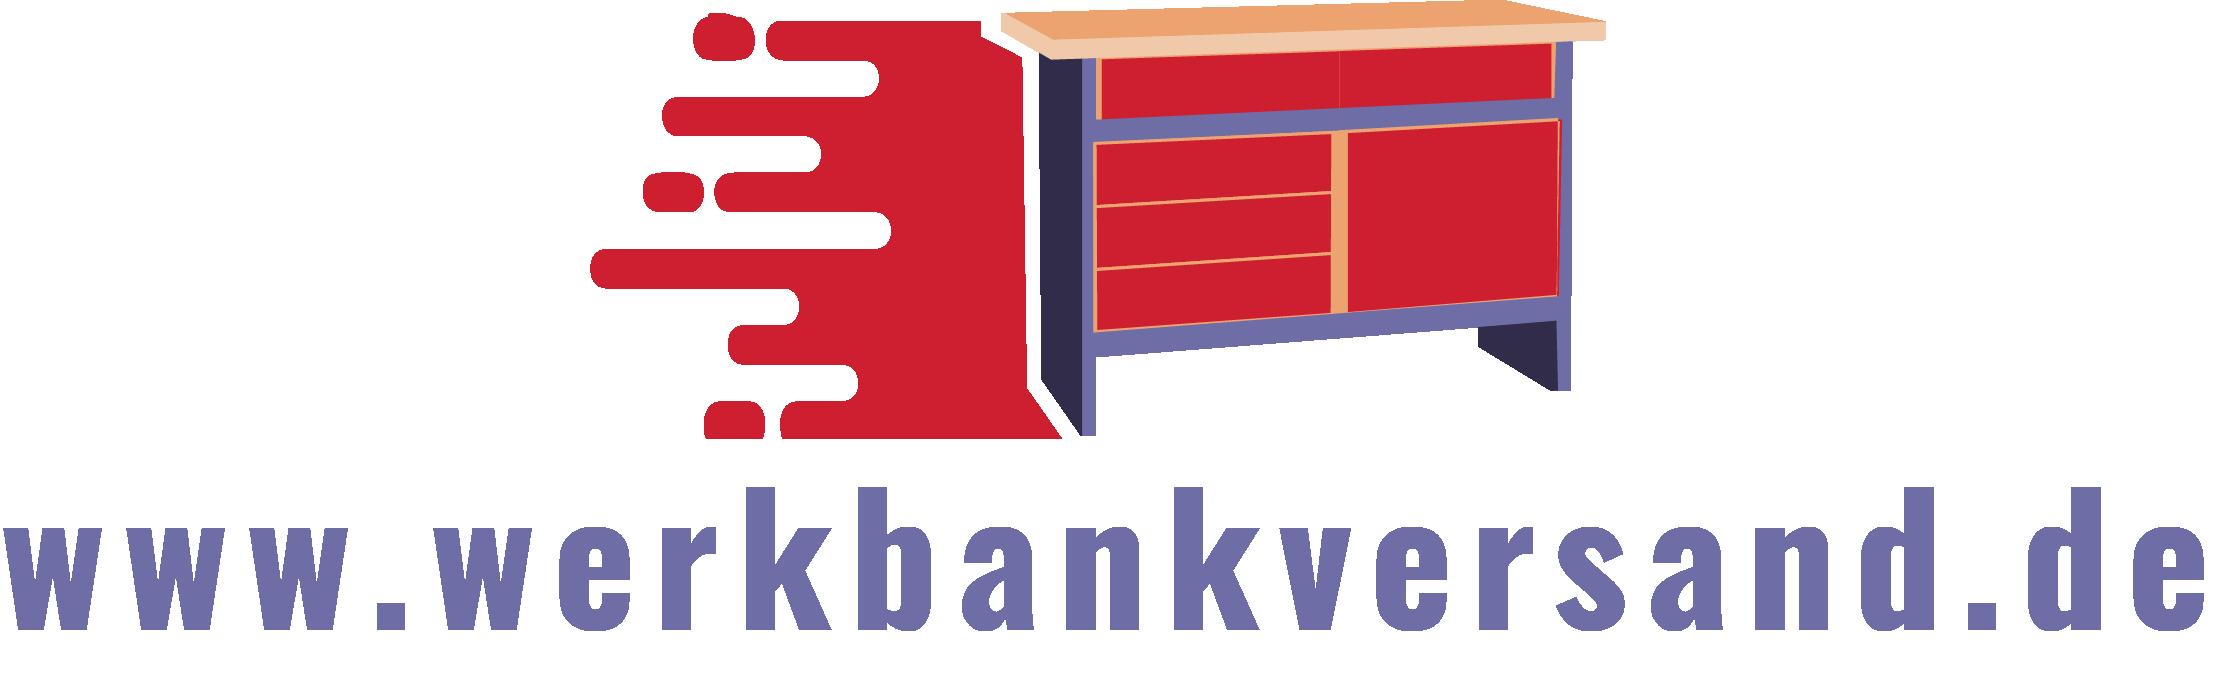 logo www.werkbankversand.de groß